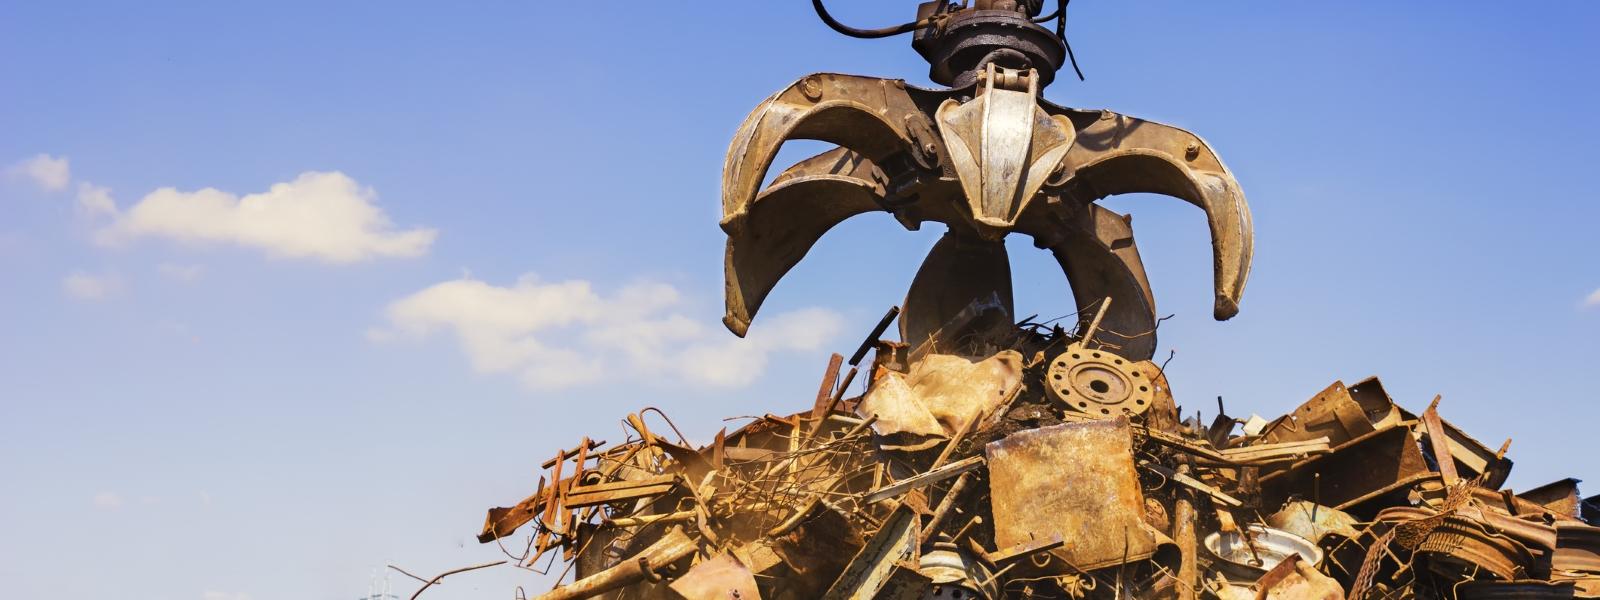 Scrap Vehicle Removal Croydon